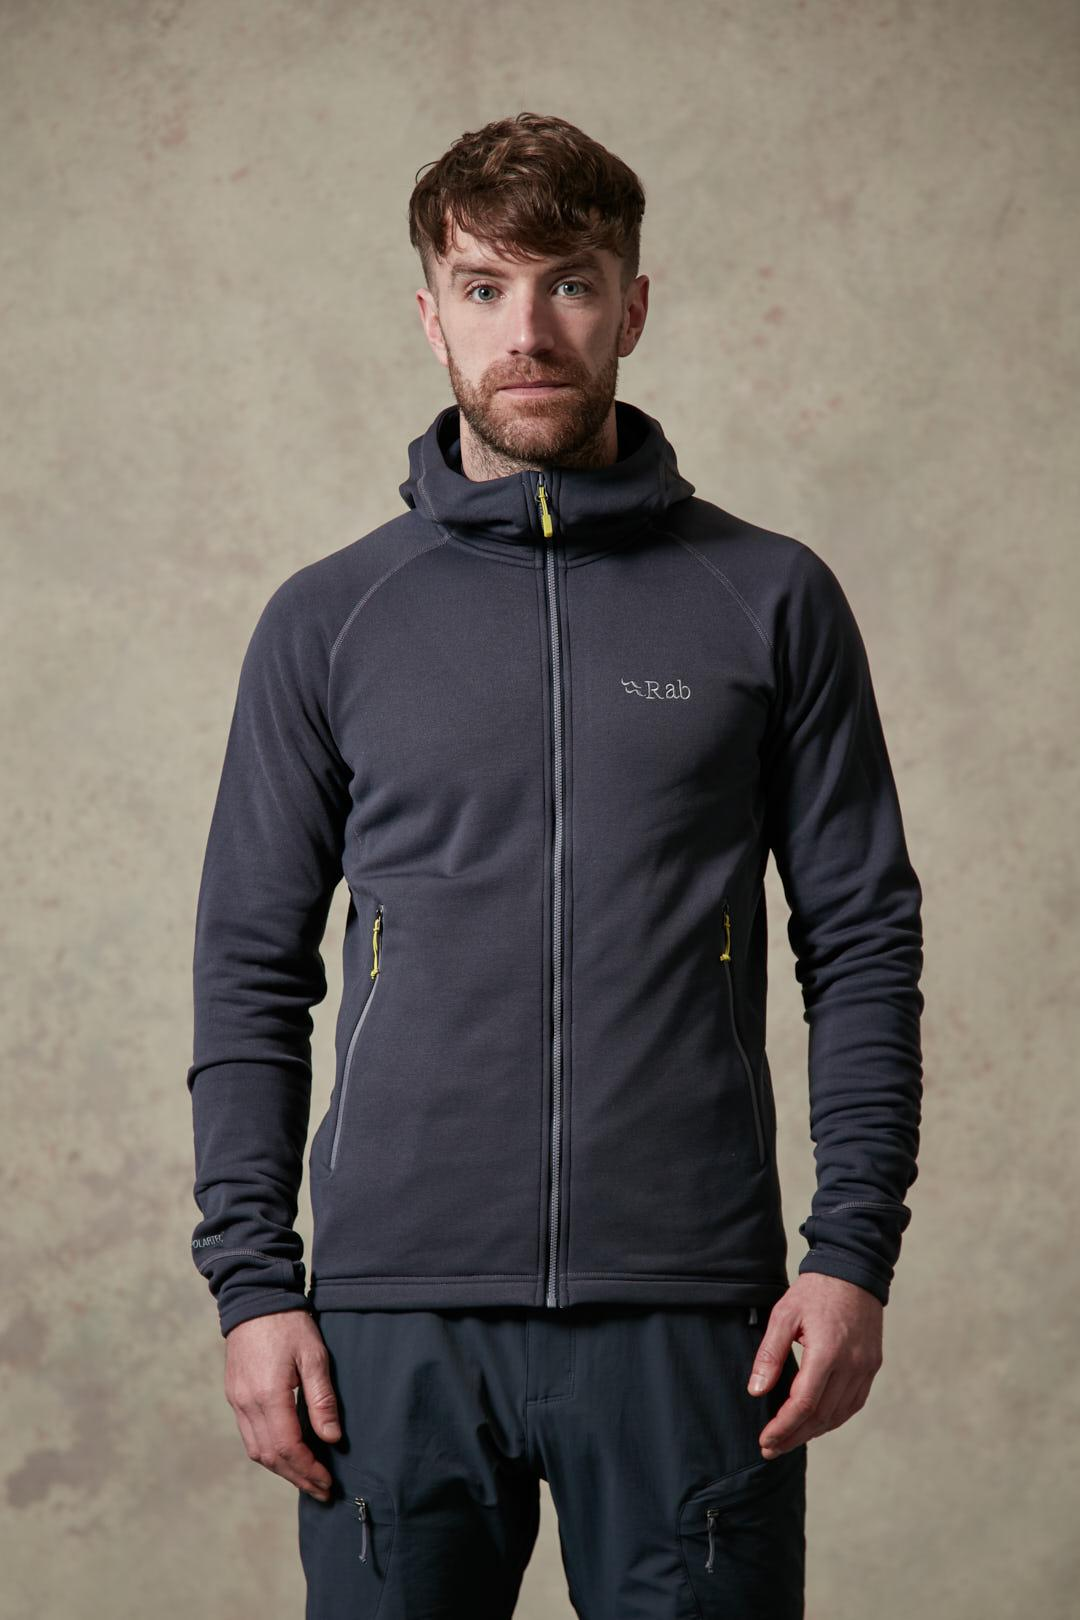 a61f8062c928ee RAB Power Stretch Pro Fleece Jacket   Magic Mount Shop